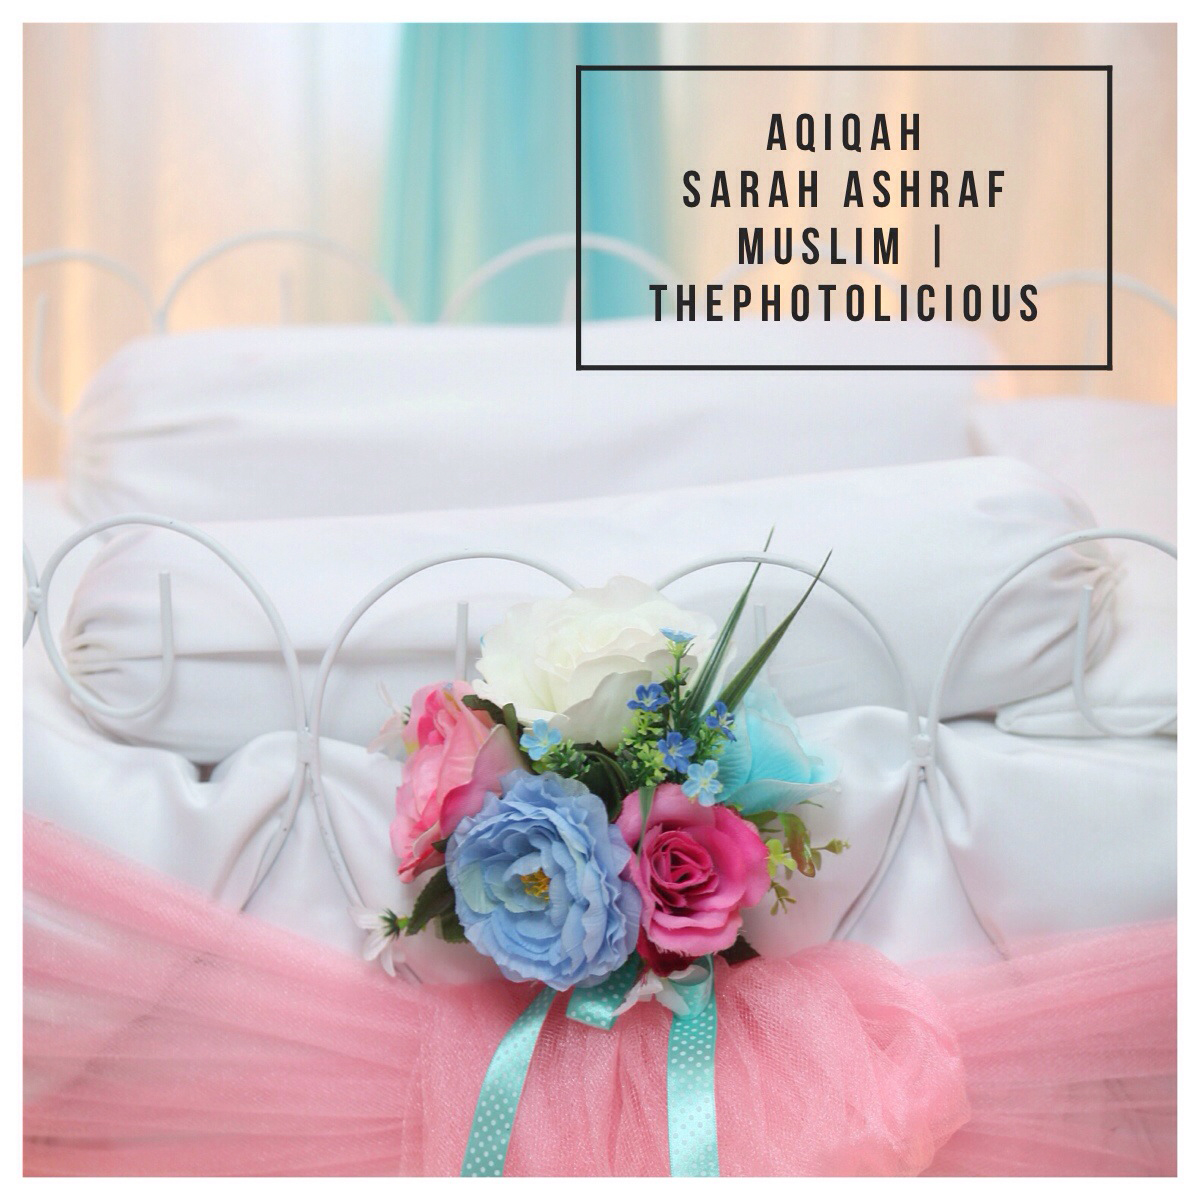 Gambar Majlis Aqiqah Ashraf Muslim